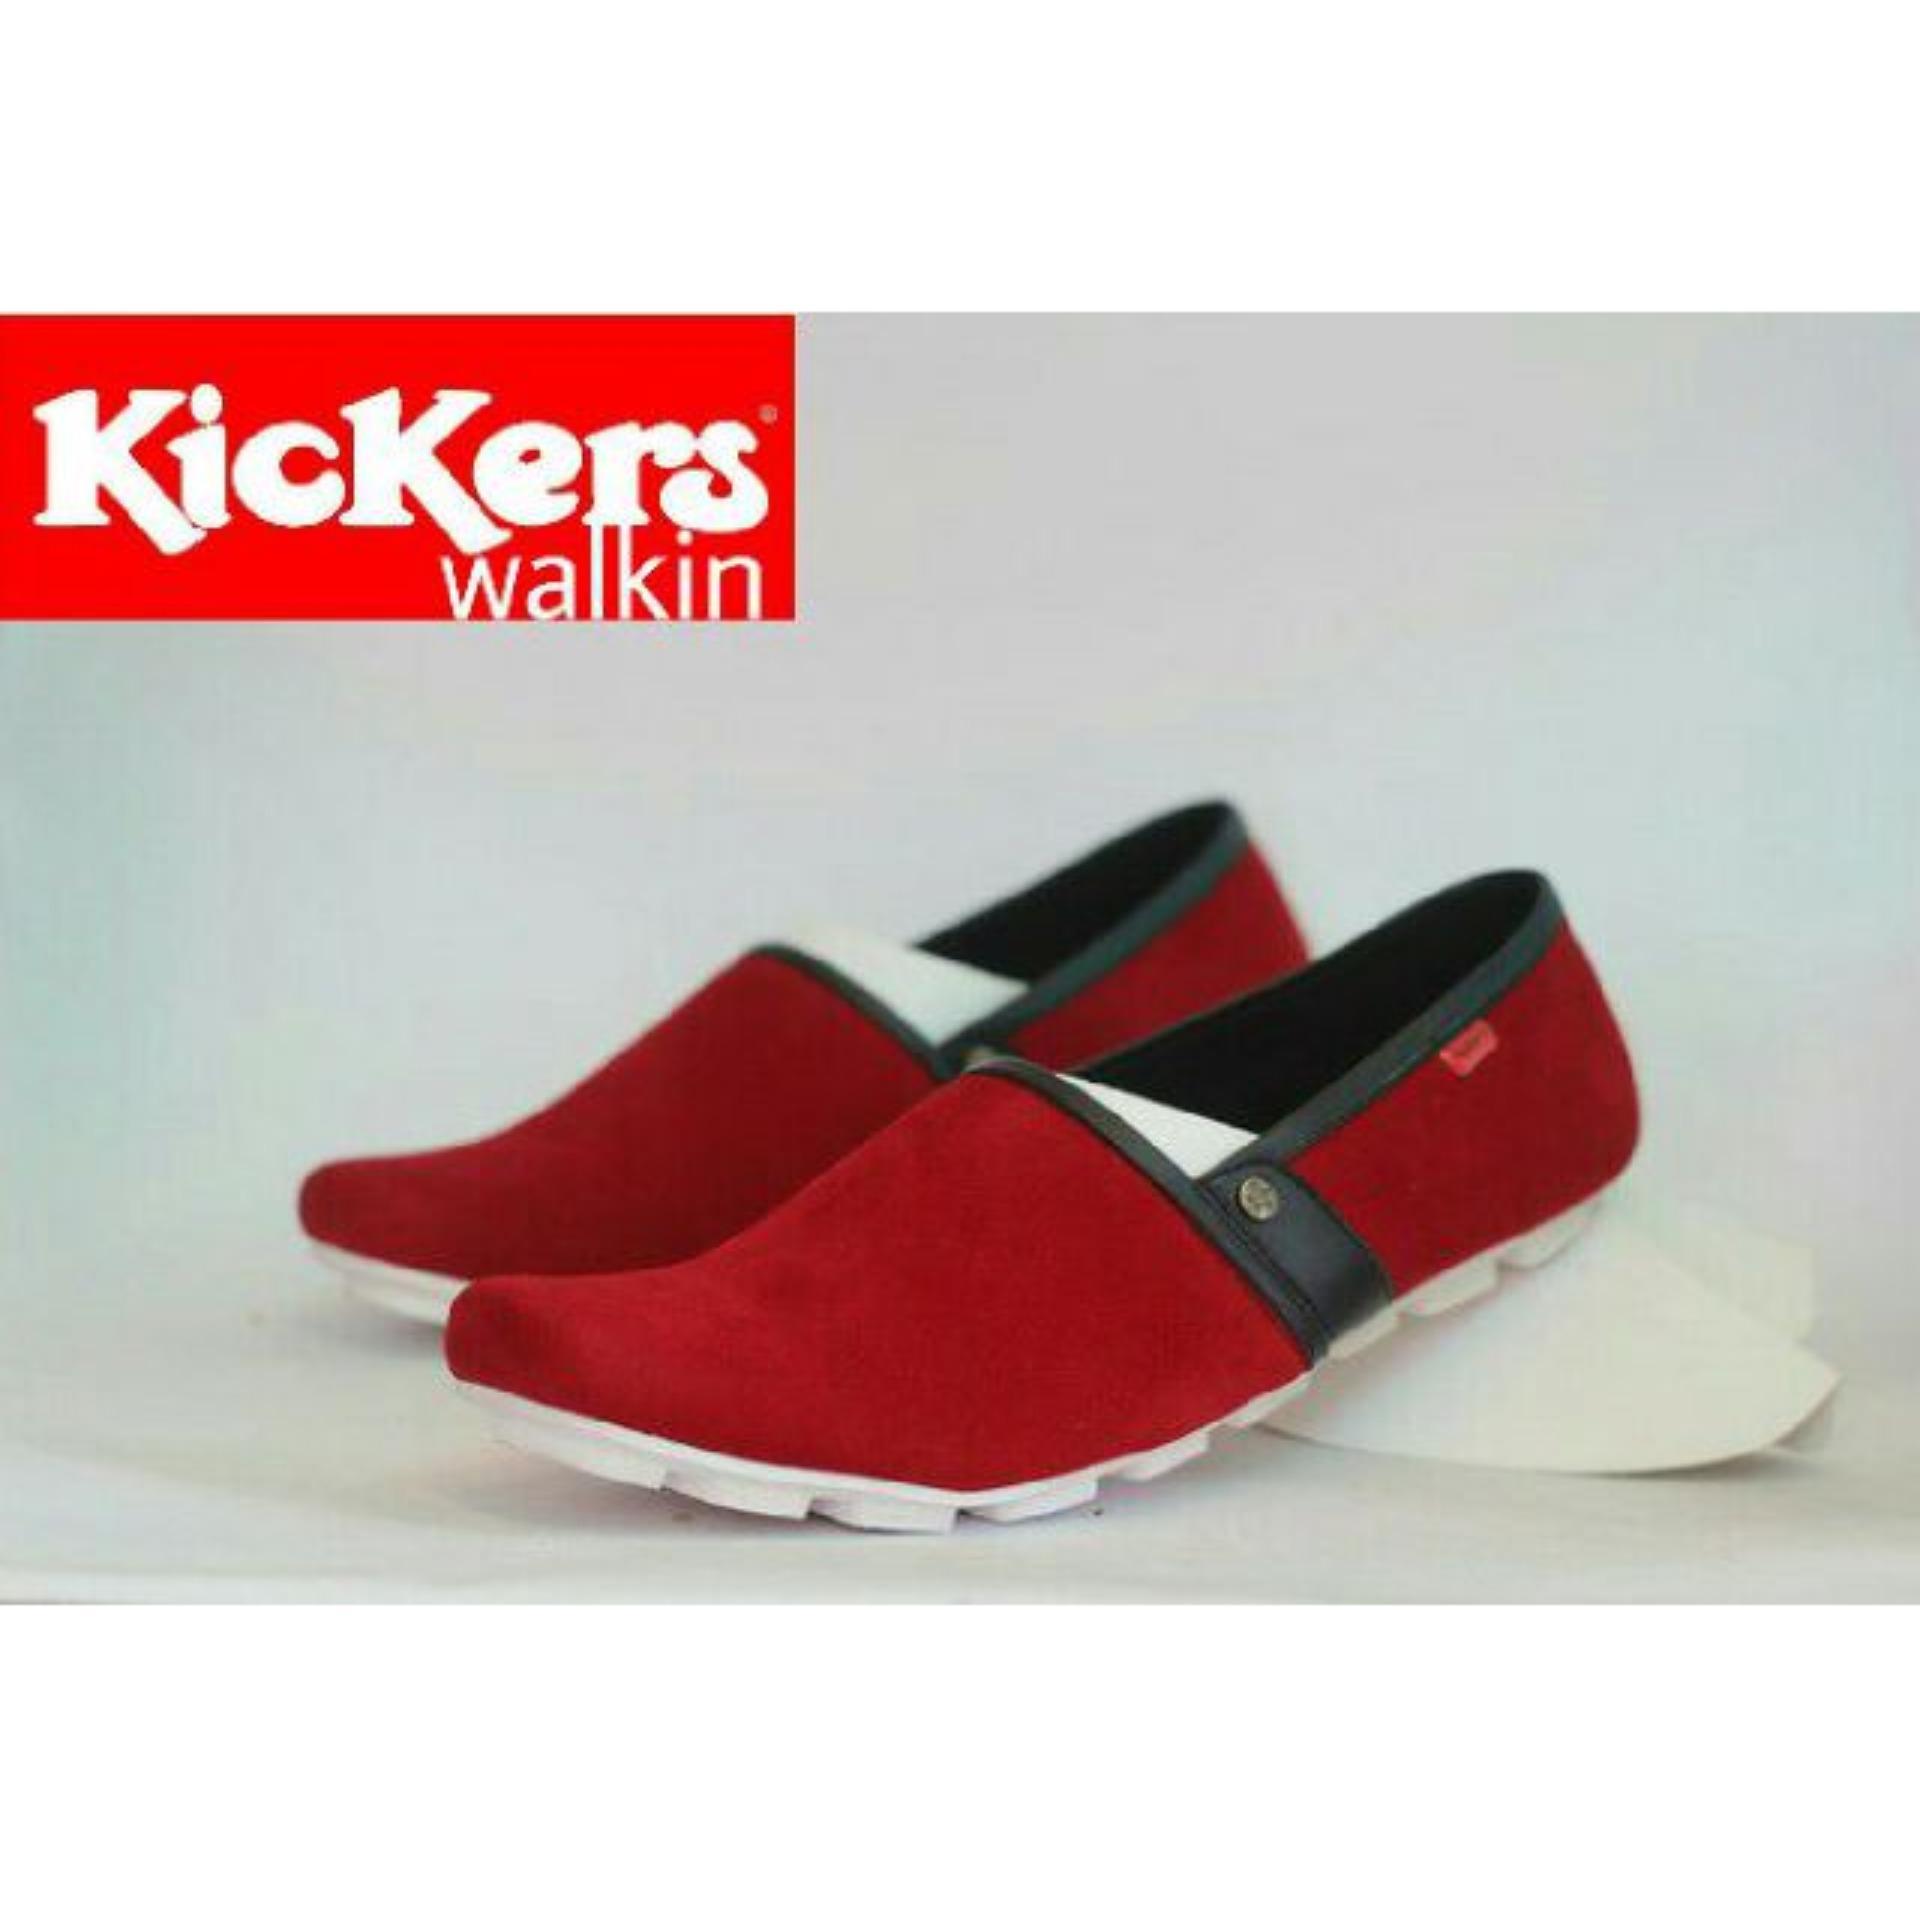 Spesifikasi Sepatu Casual Pria Slip On Pria Kickers Walkin Kulit Suede Free Kaos Kaki Online